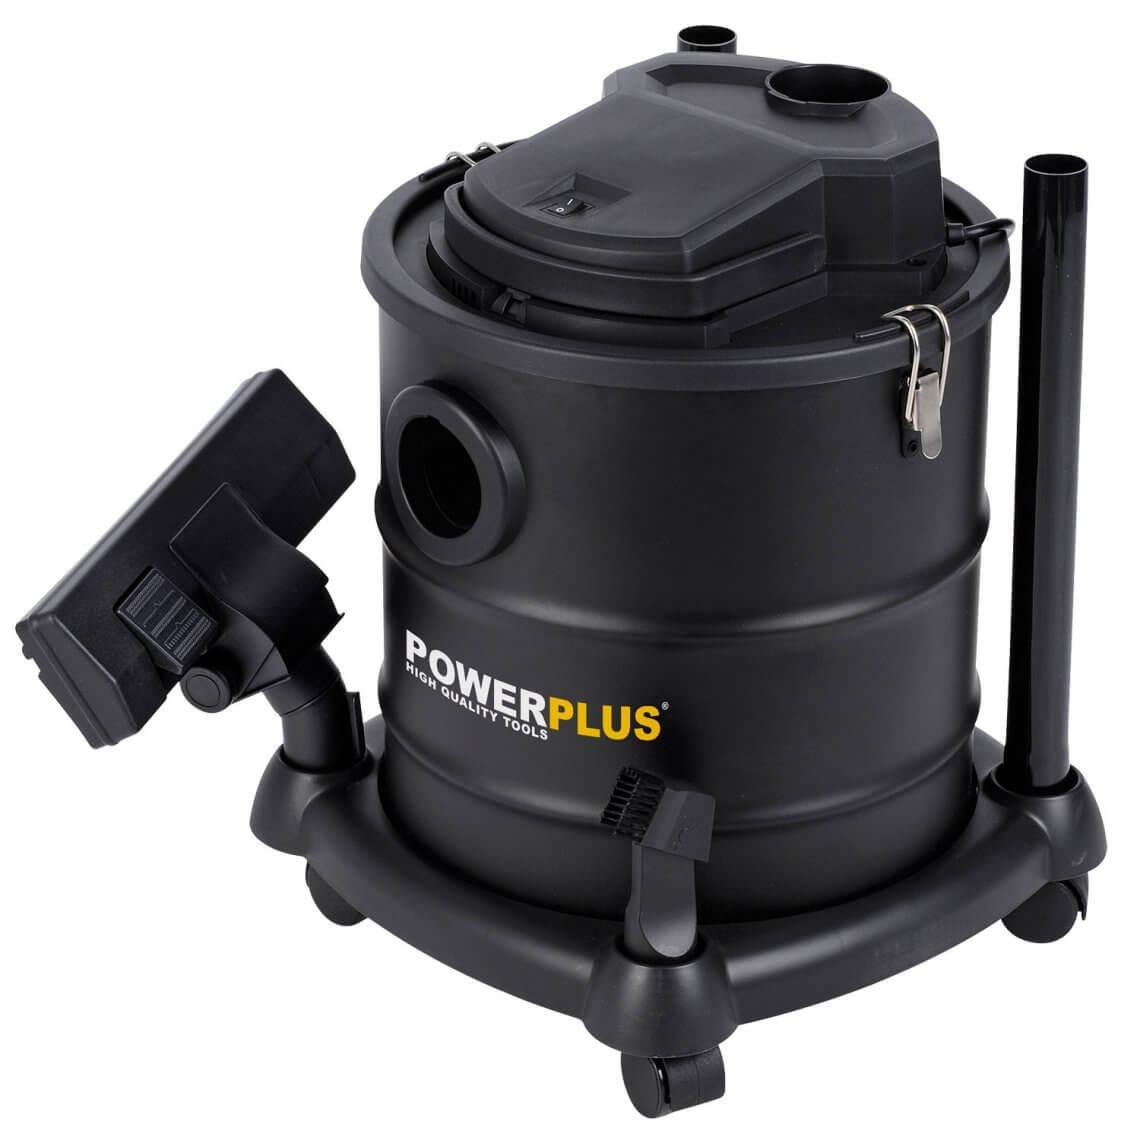 Aspirateur sans sac pour cendres : PowerPlus POWX308 Kazaalite